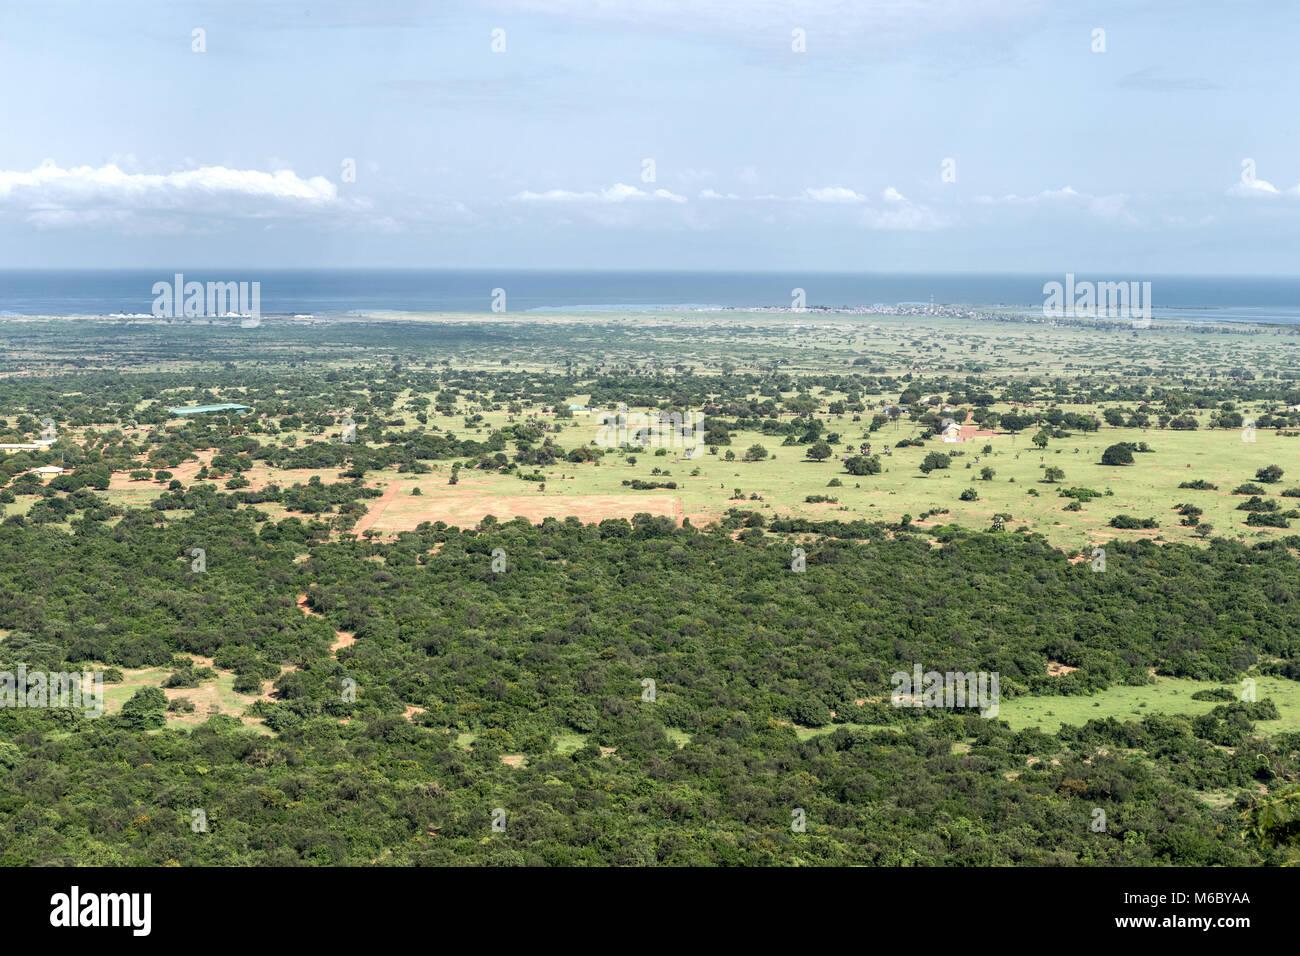 Overlooking Great Rift Valley,  Queen Elizabeth National Park including Lake Albert (distance), Uganda, Africa Stock Photo